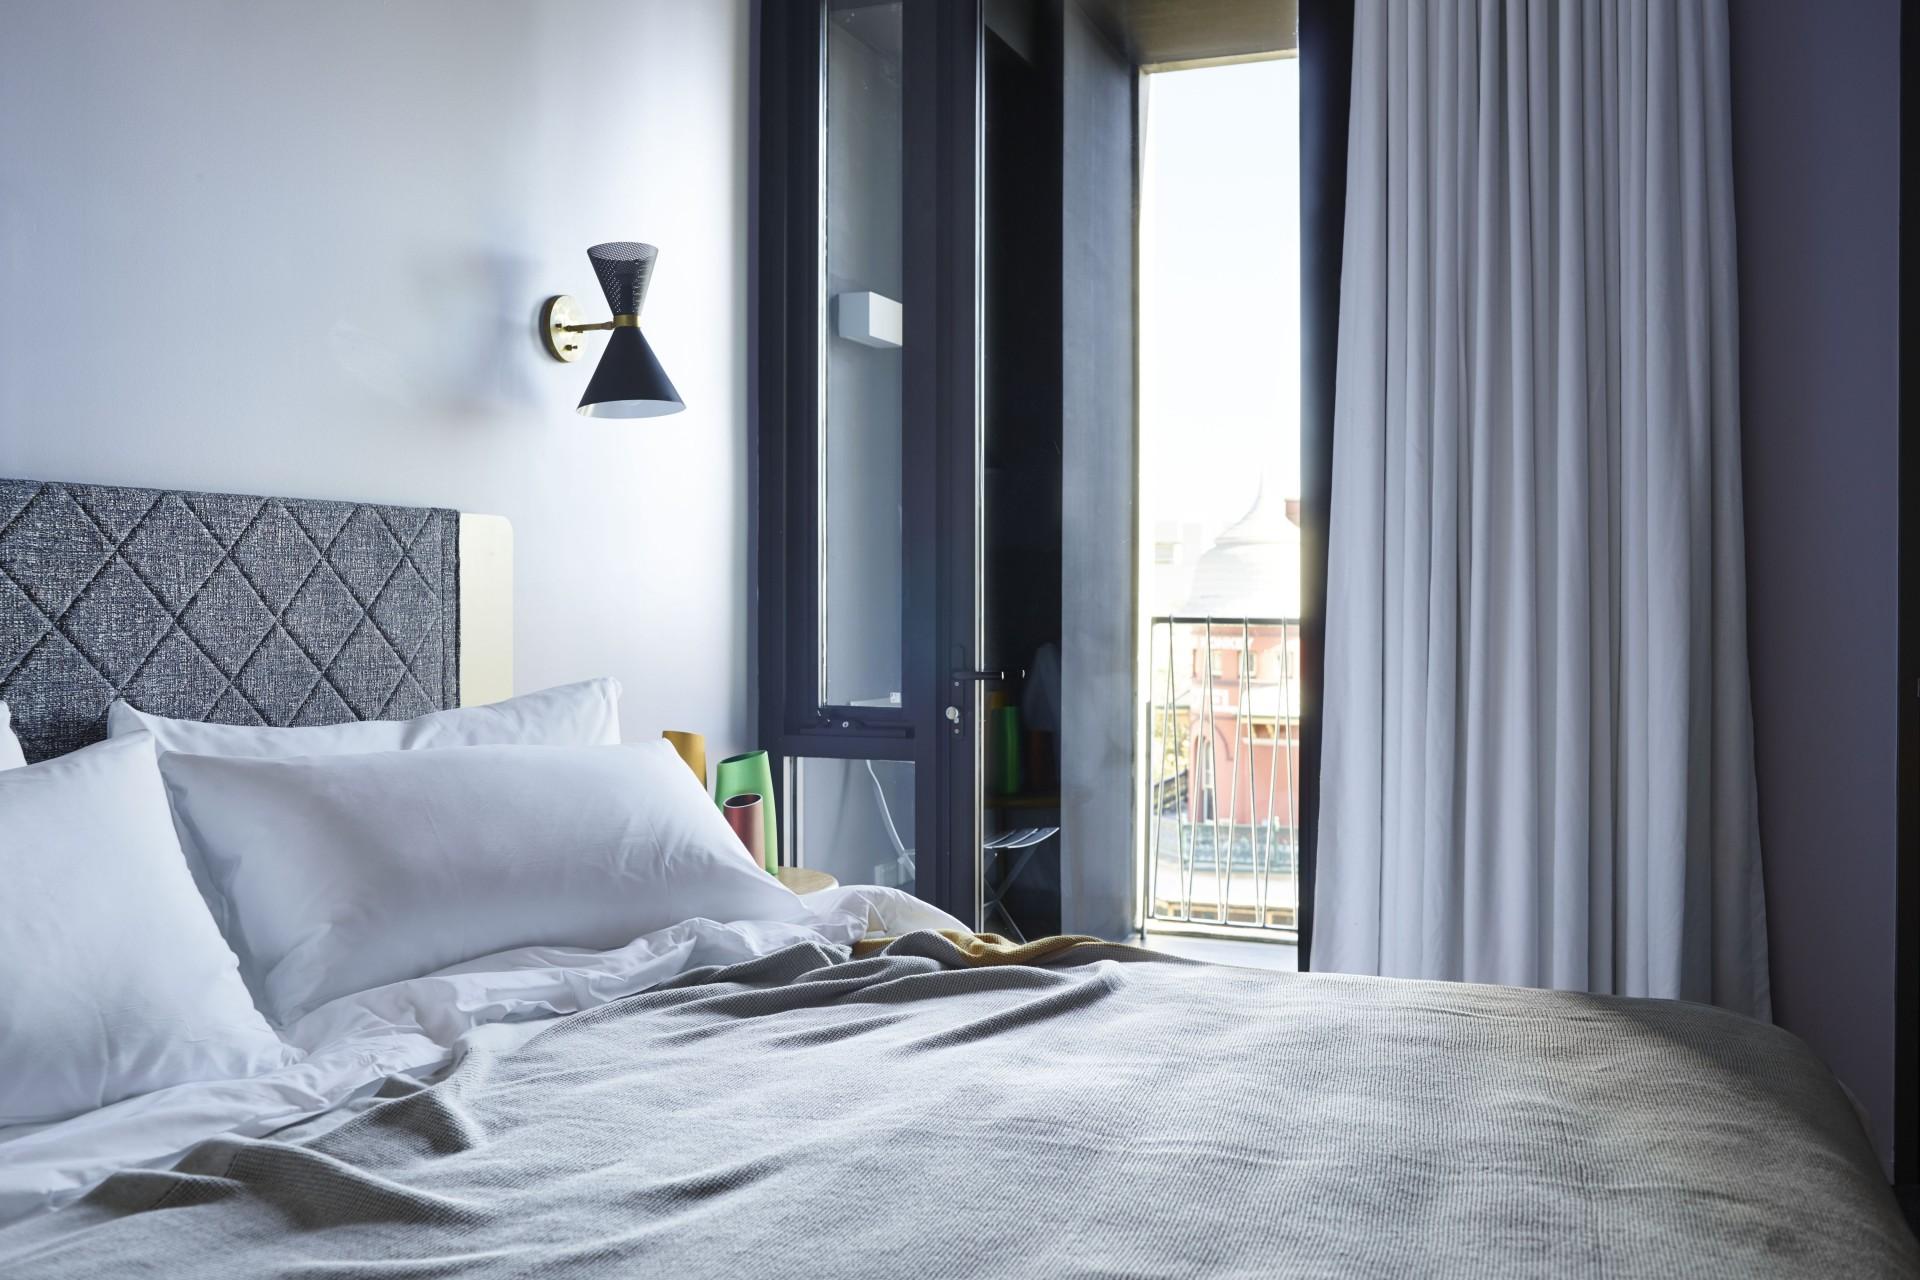 Room_404_Alex_Hotel_250515_798191-e1434527997242